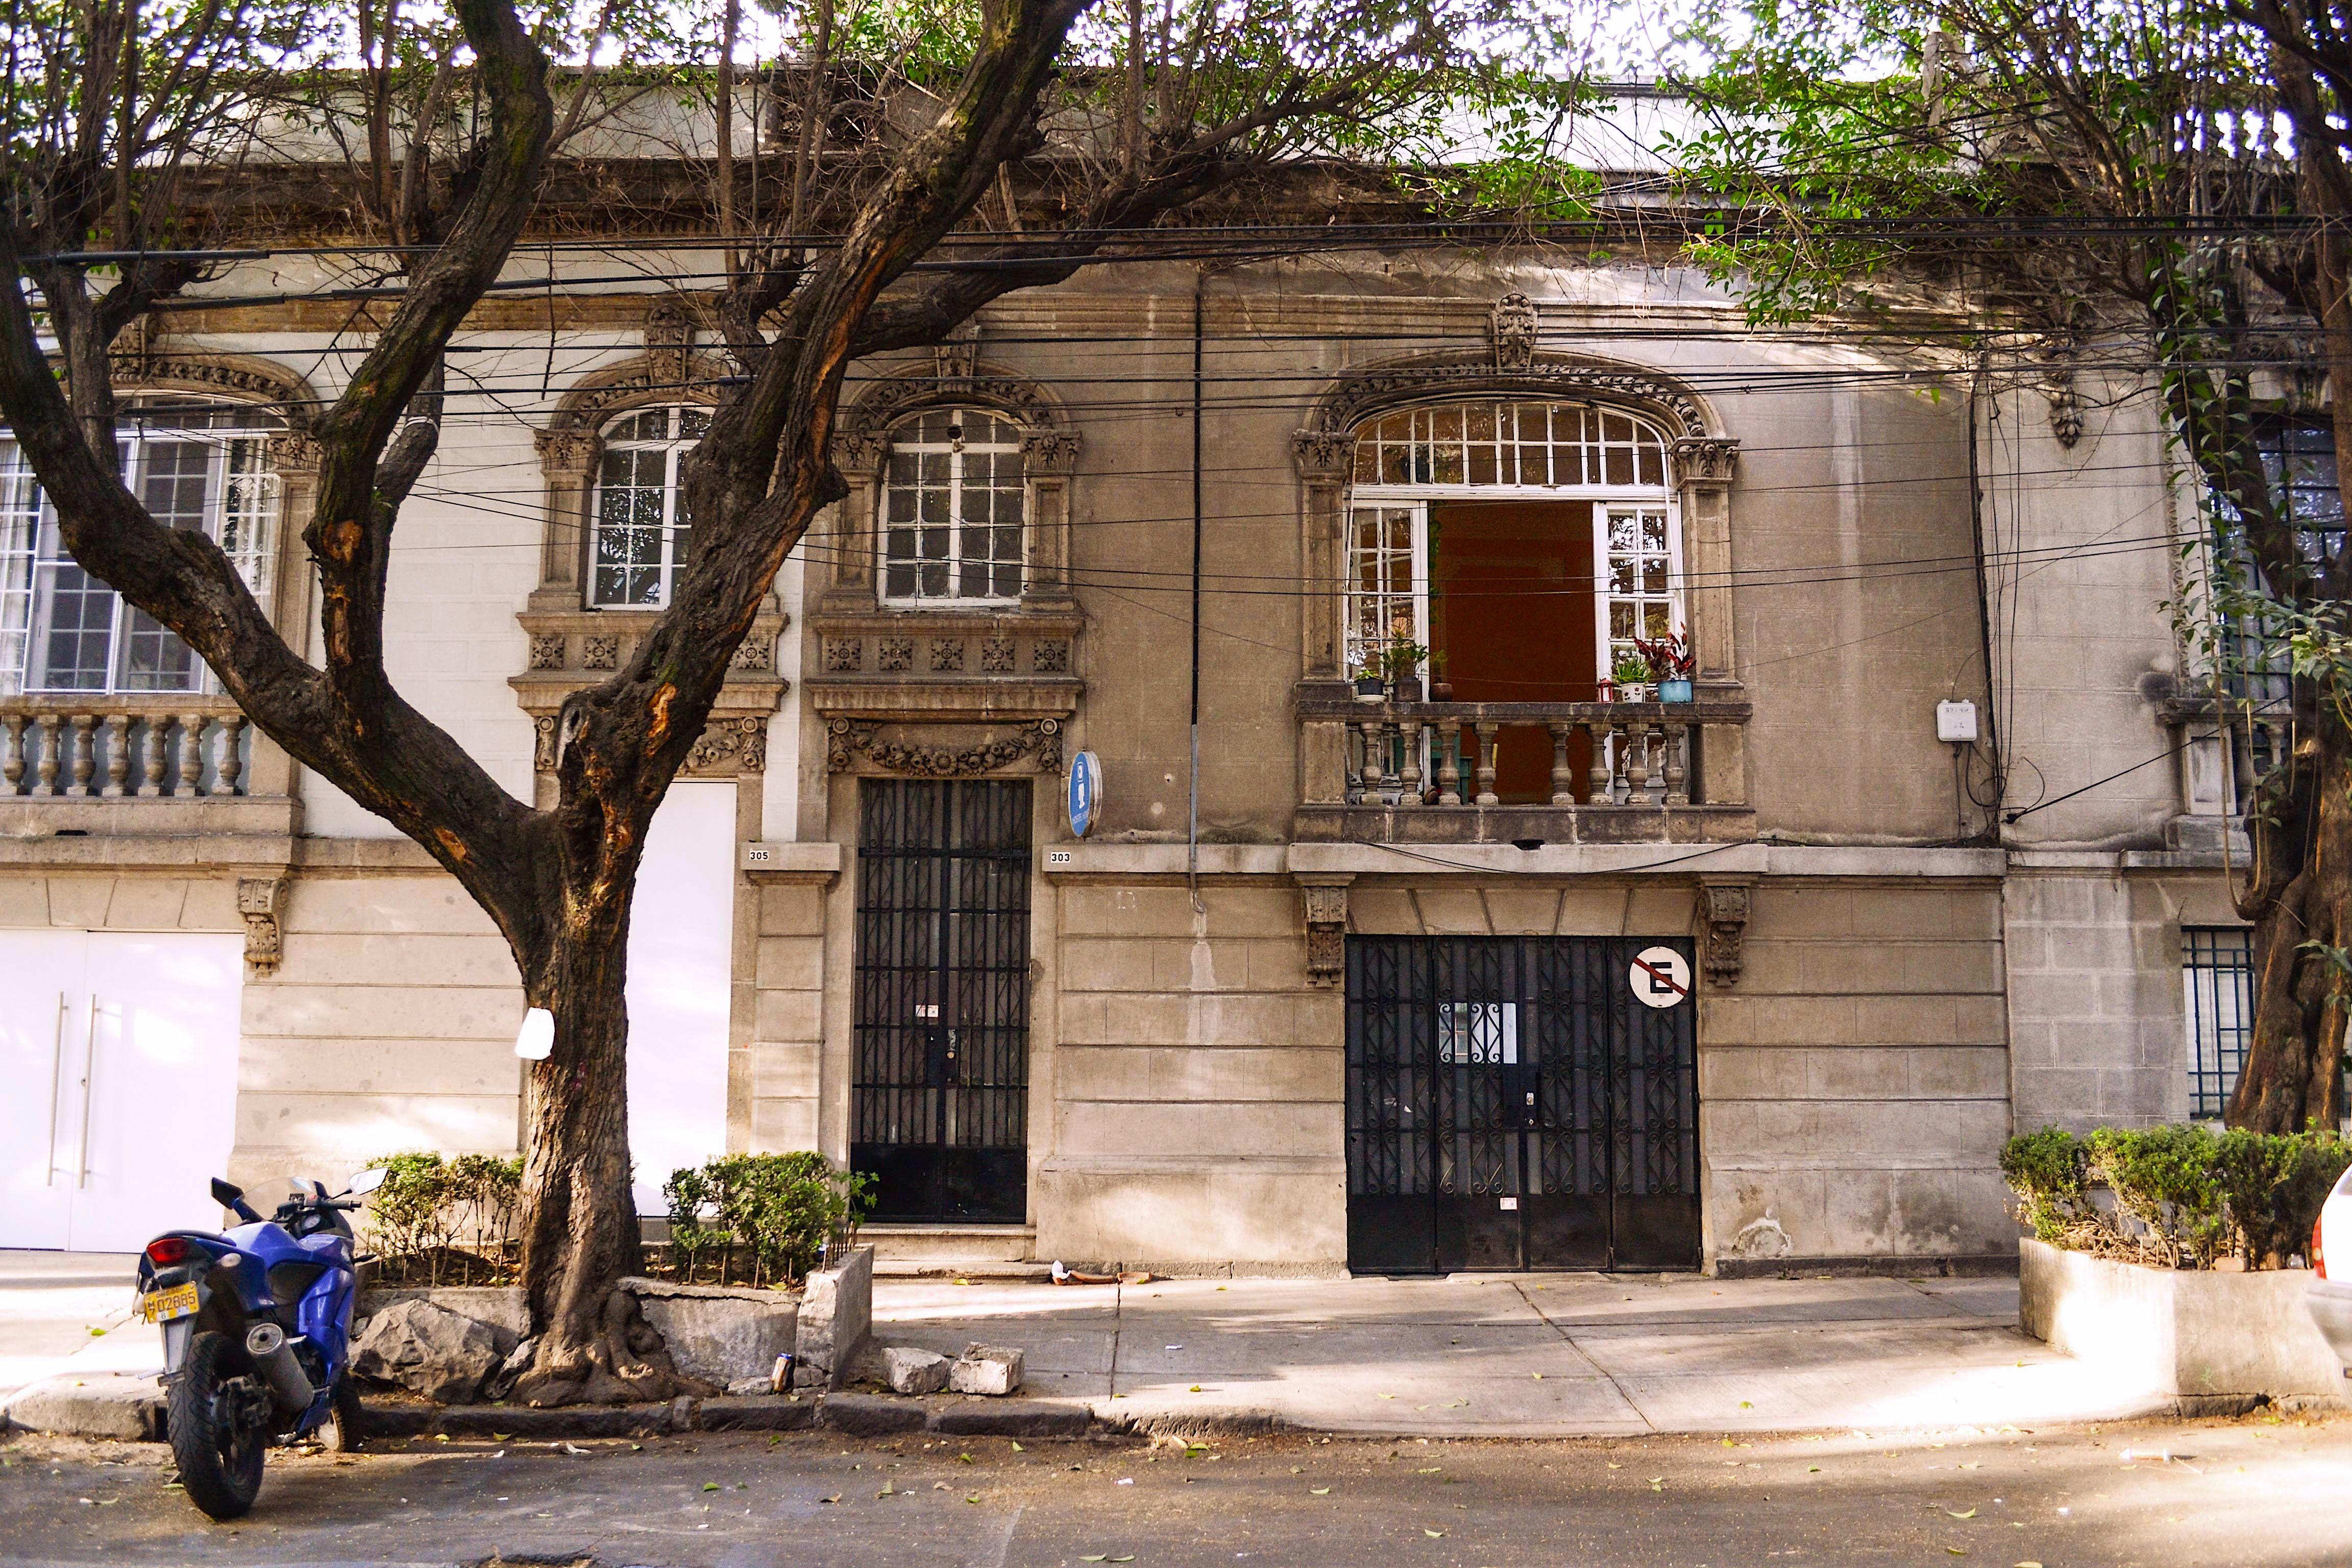 HOSTEL - Hostel Home